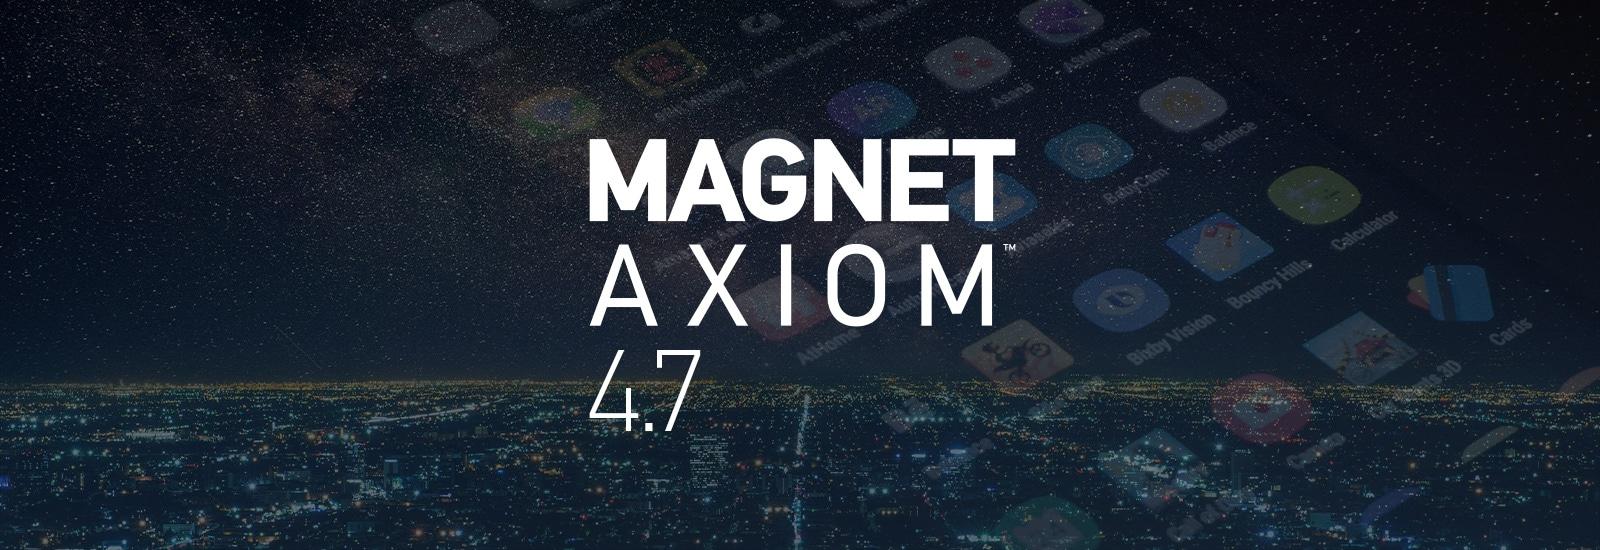 AXIOM 4.7